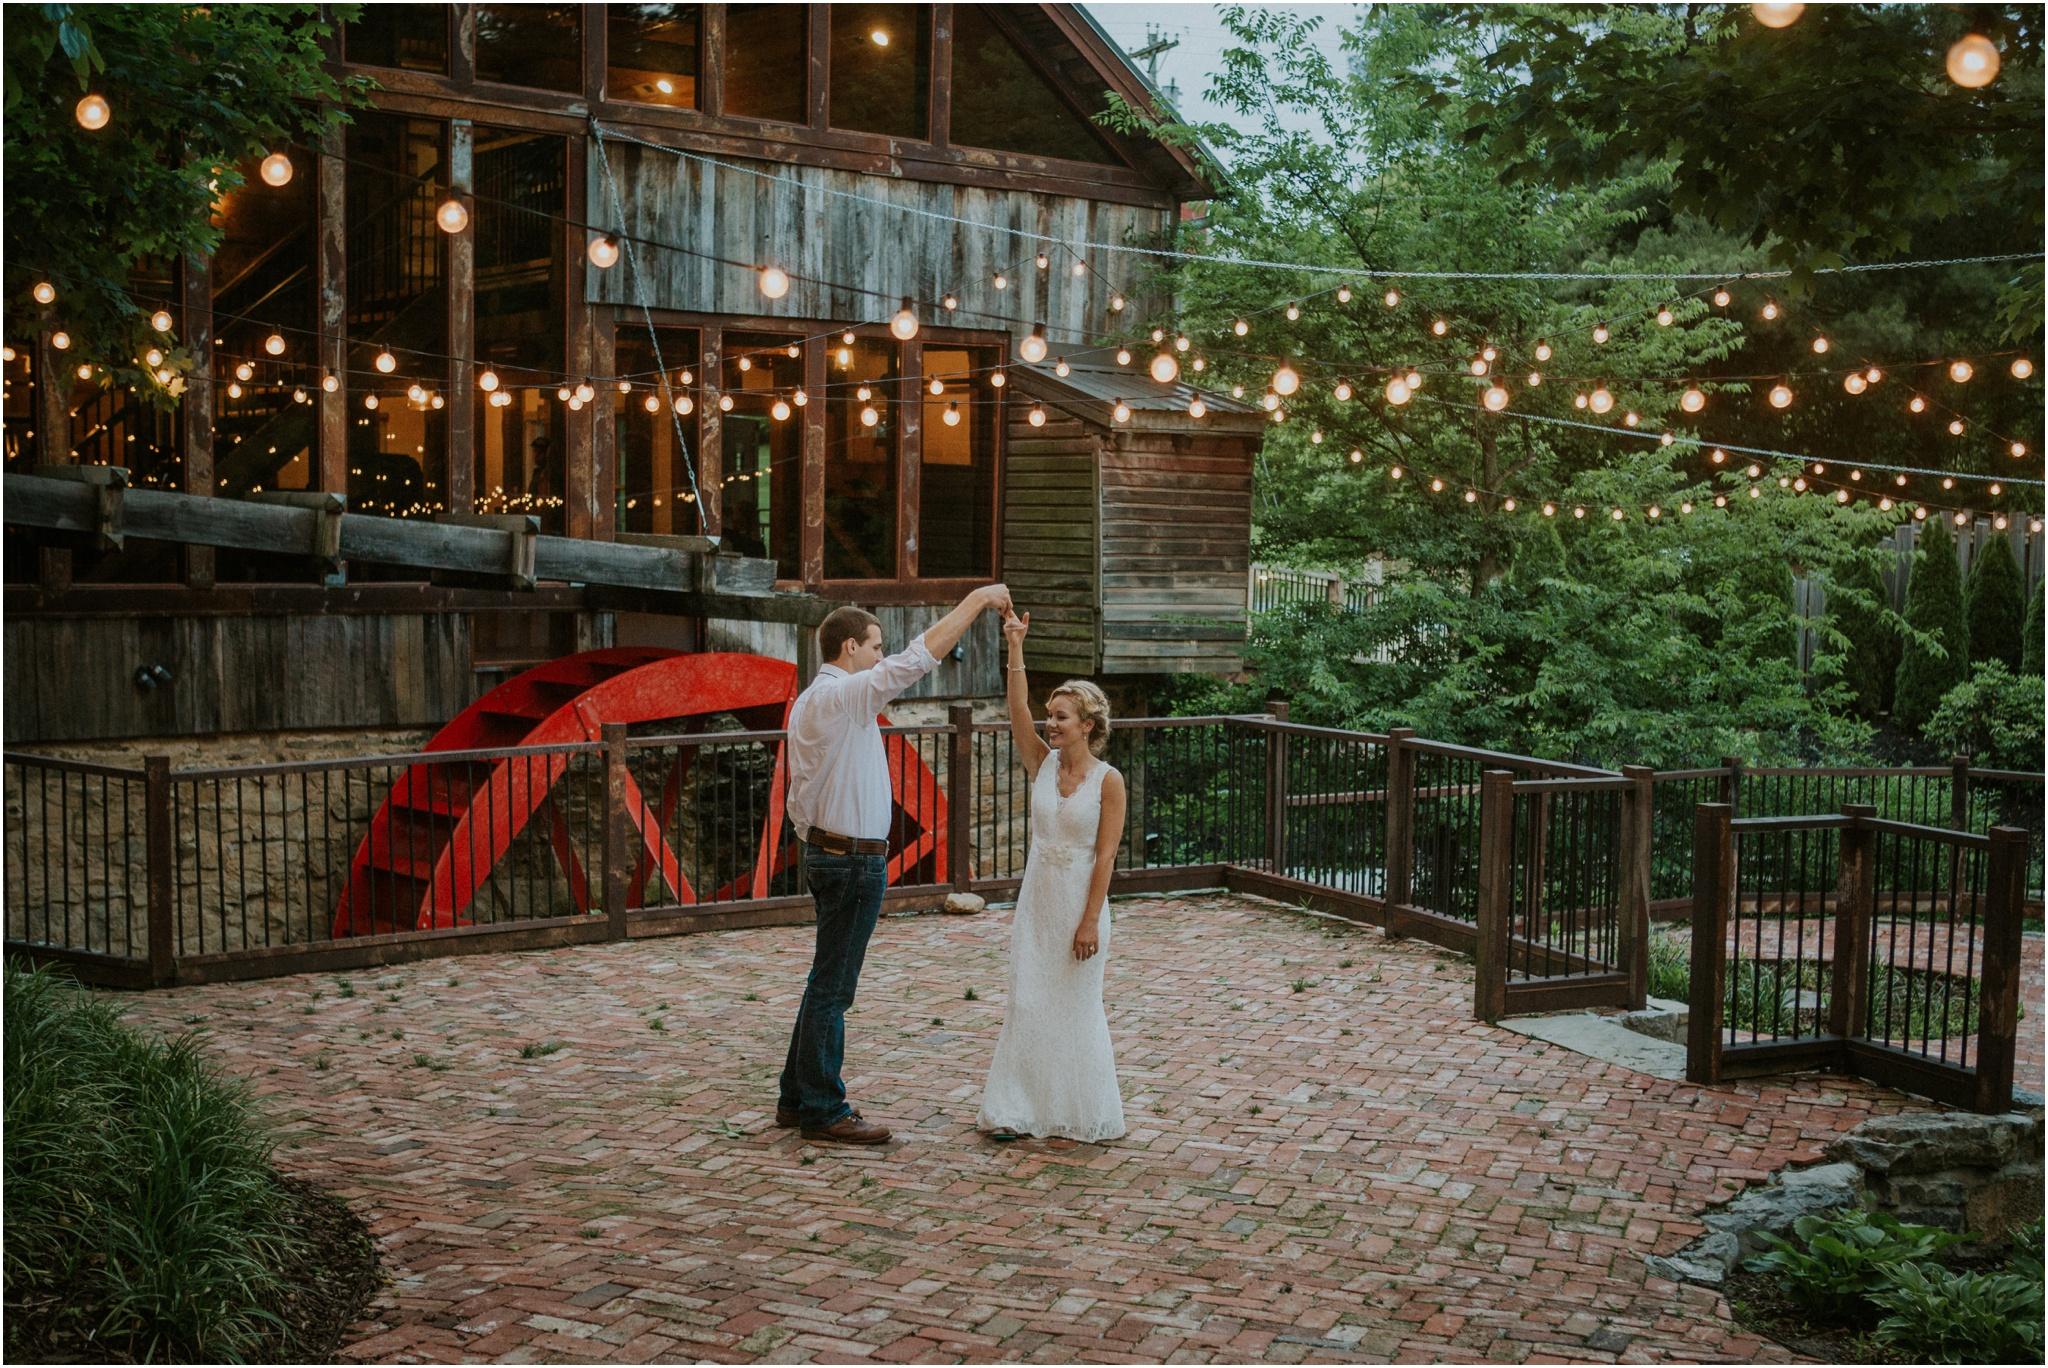 the-millstone-limestone-rustic-intimate-outdoors-backyard-wedding-wildflowers-tennessee_0109.jpg